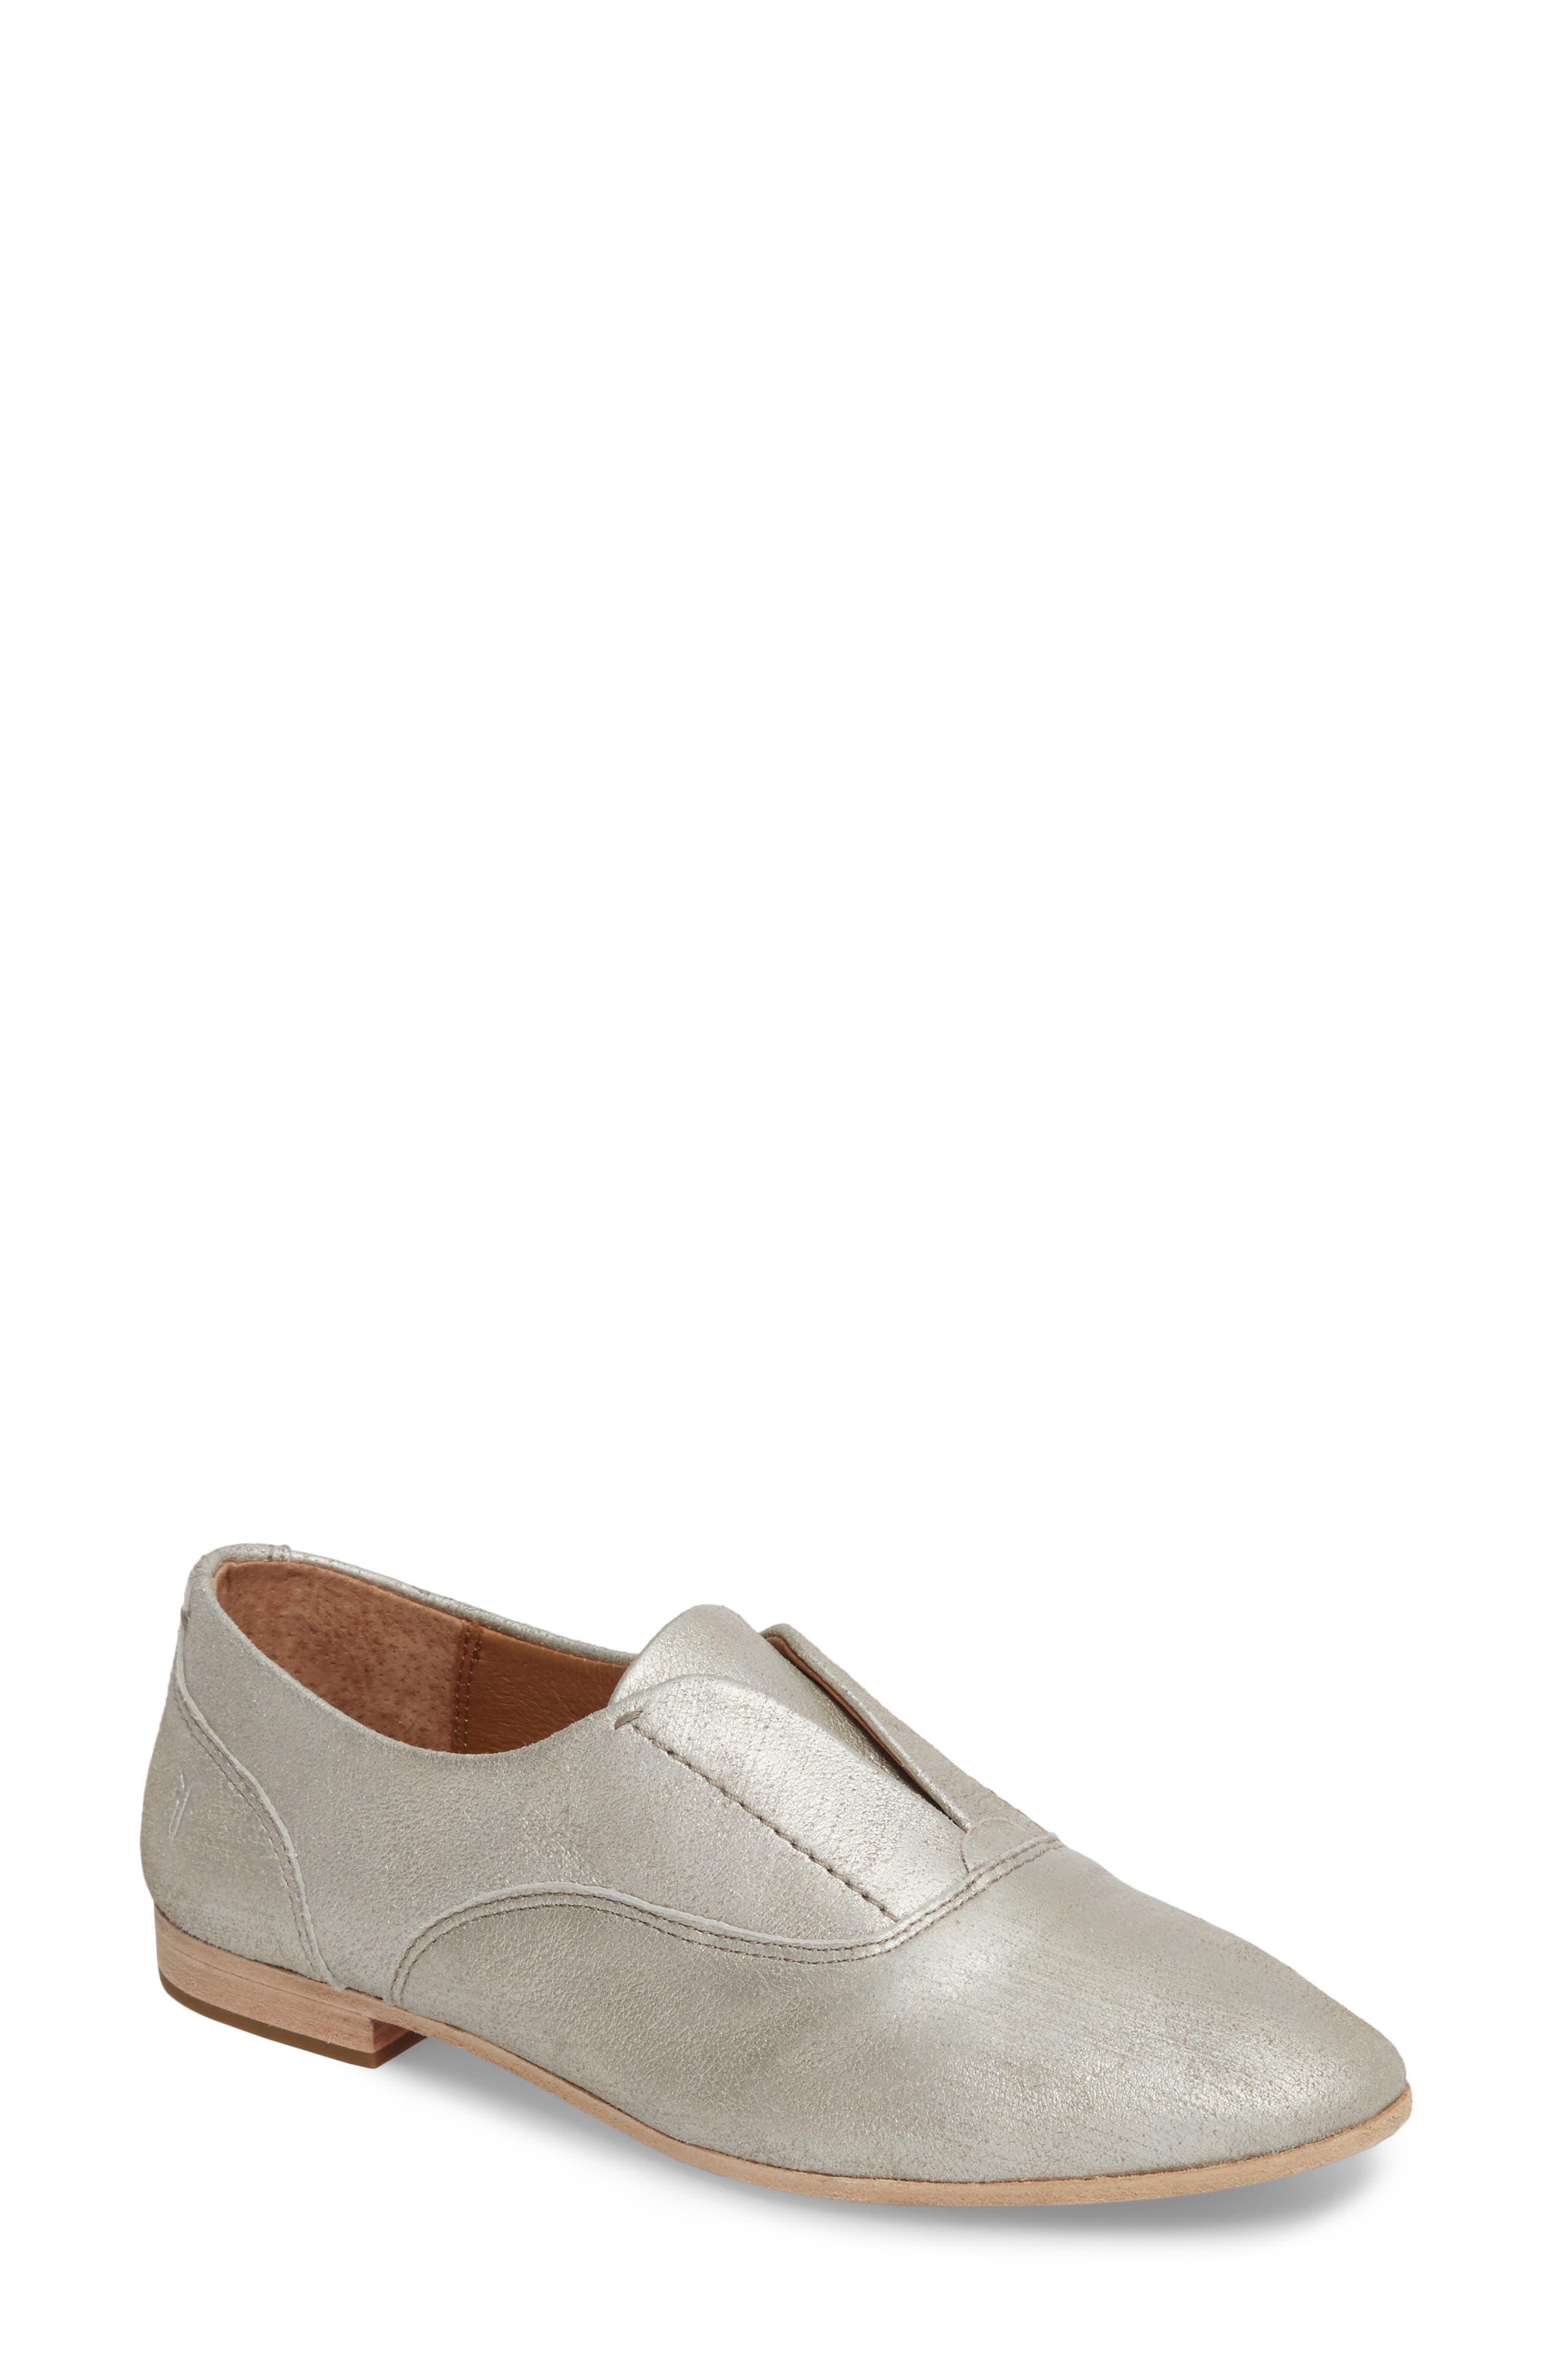 Terri Laceless Oxford,                         Main,                         color, Silver Leather